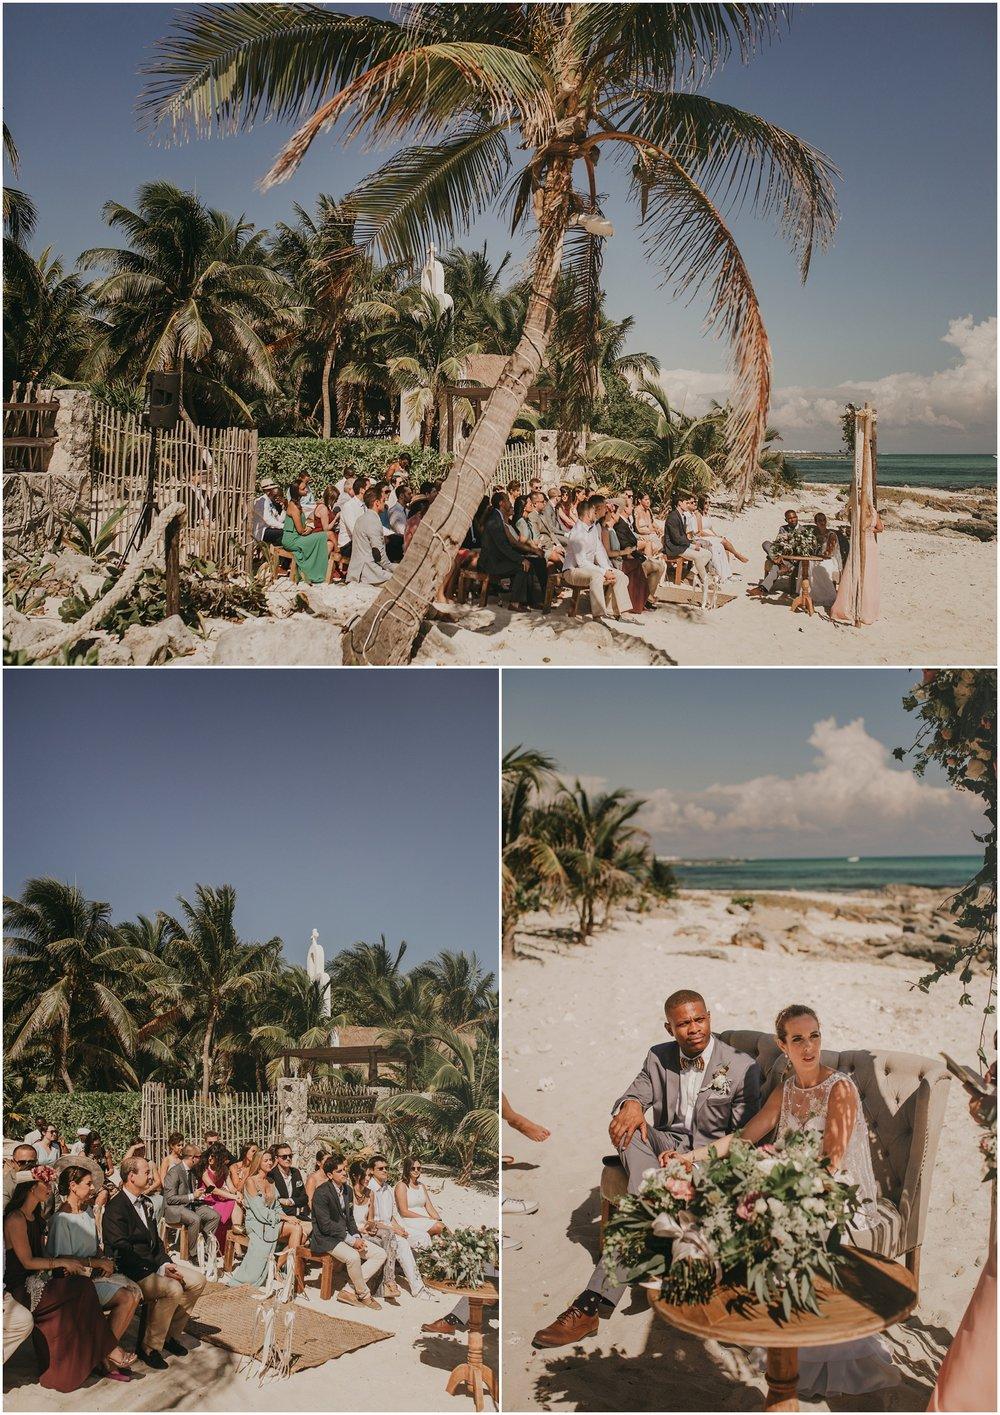 Pablo Laguia wedding photographer 072.jpg